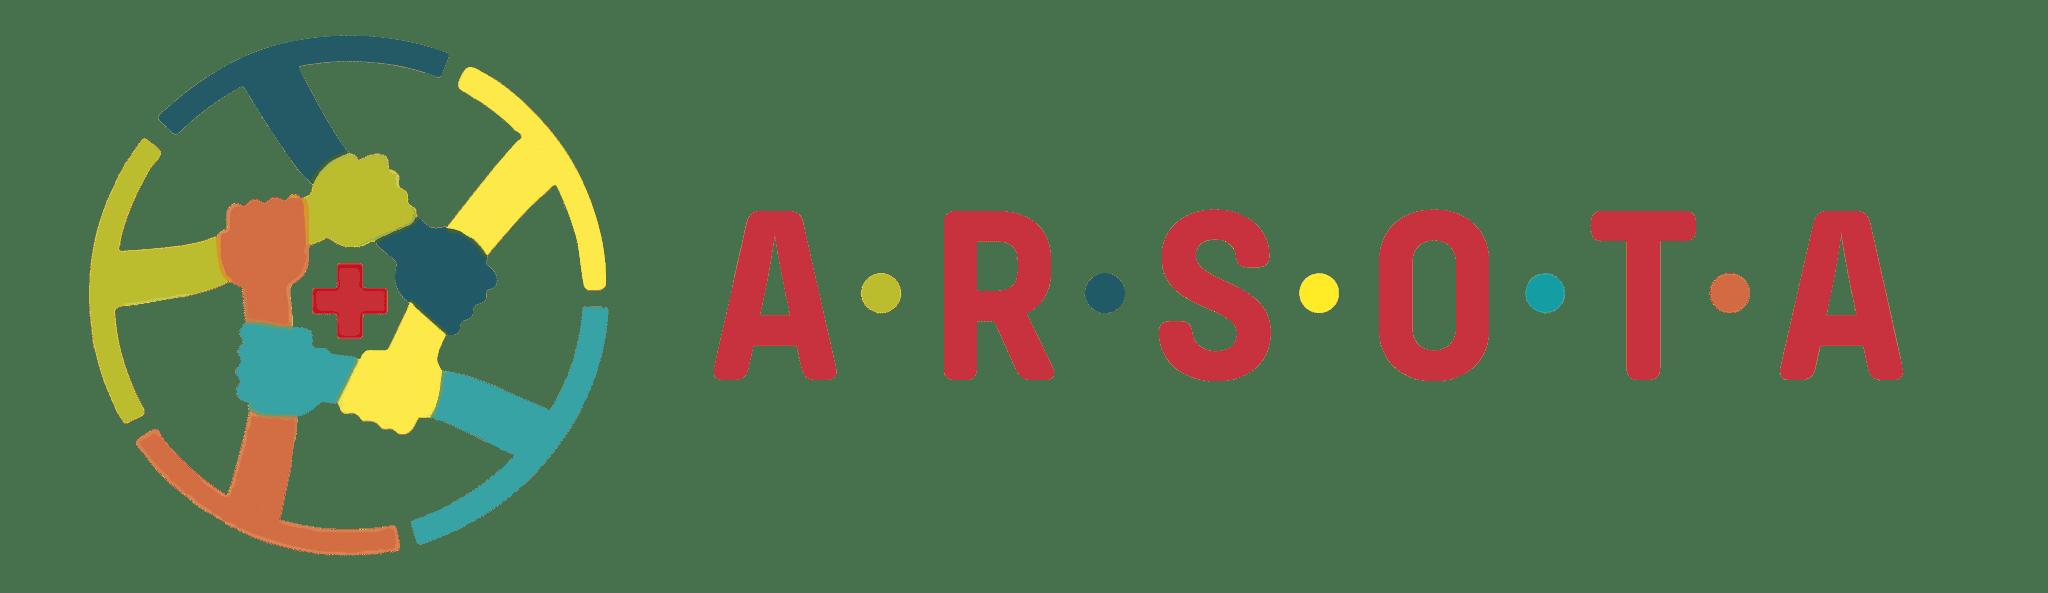 ArsotaOrizzontale2 05